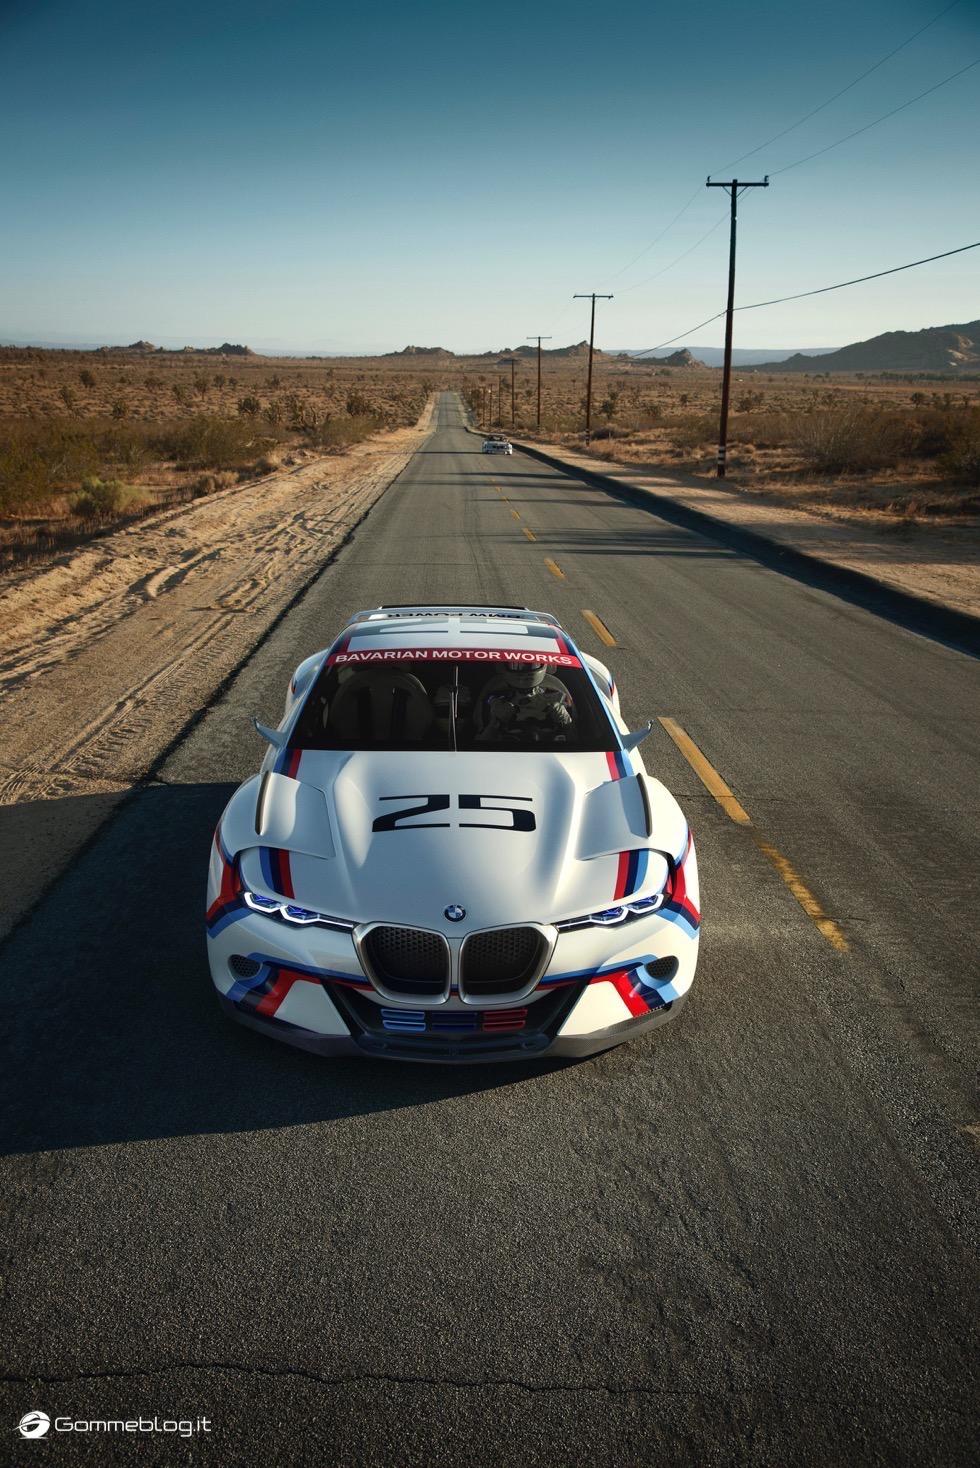 BMW 3.0 CSL Hommage R - Concorso d'Eleganza di Pebble Beach 2015 8